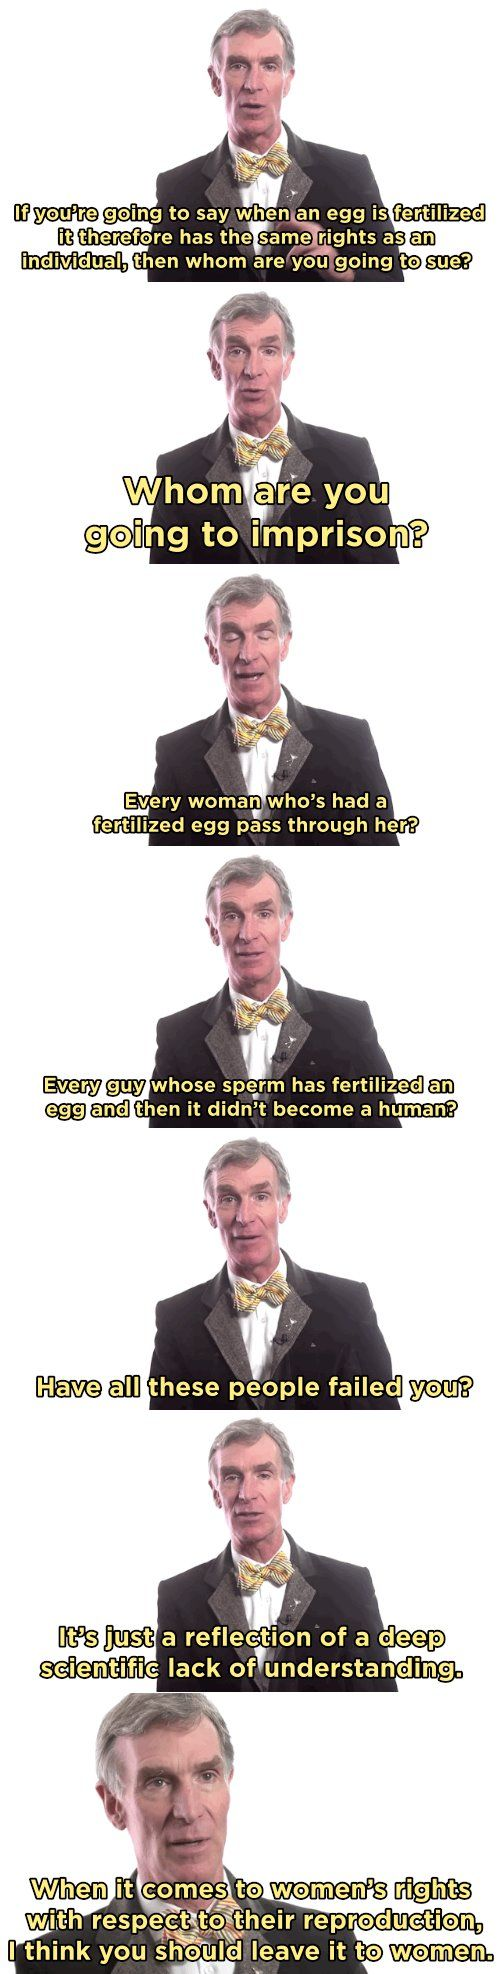 Bill Nye Debunks Anti-Abortion Logic With Science